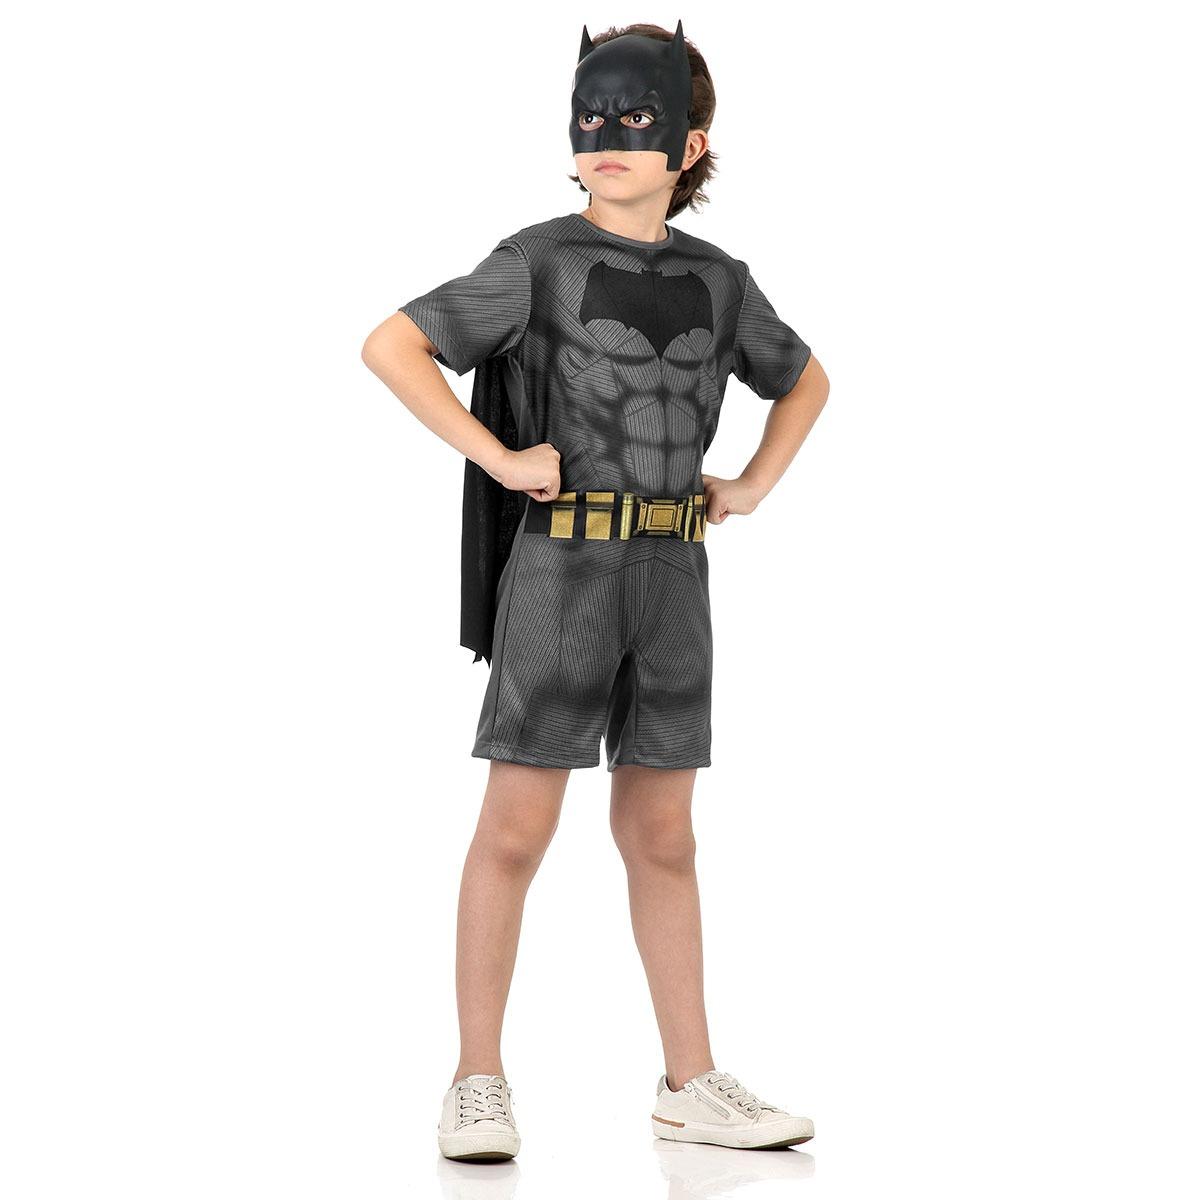 Fantasia Infantil Batman Curto